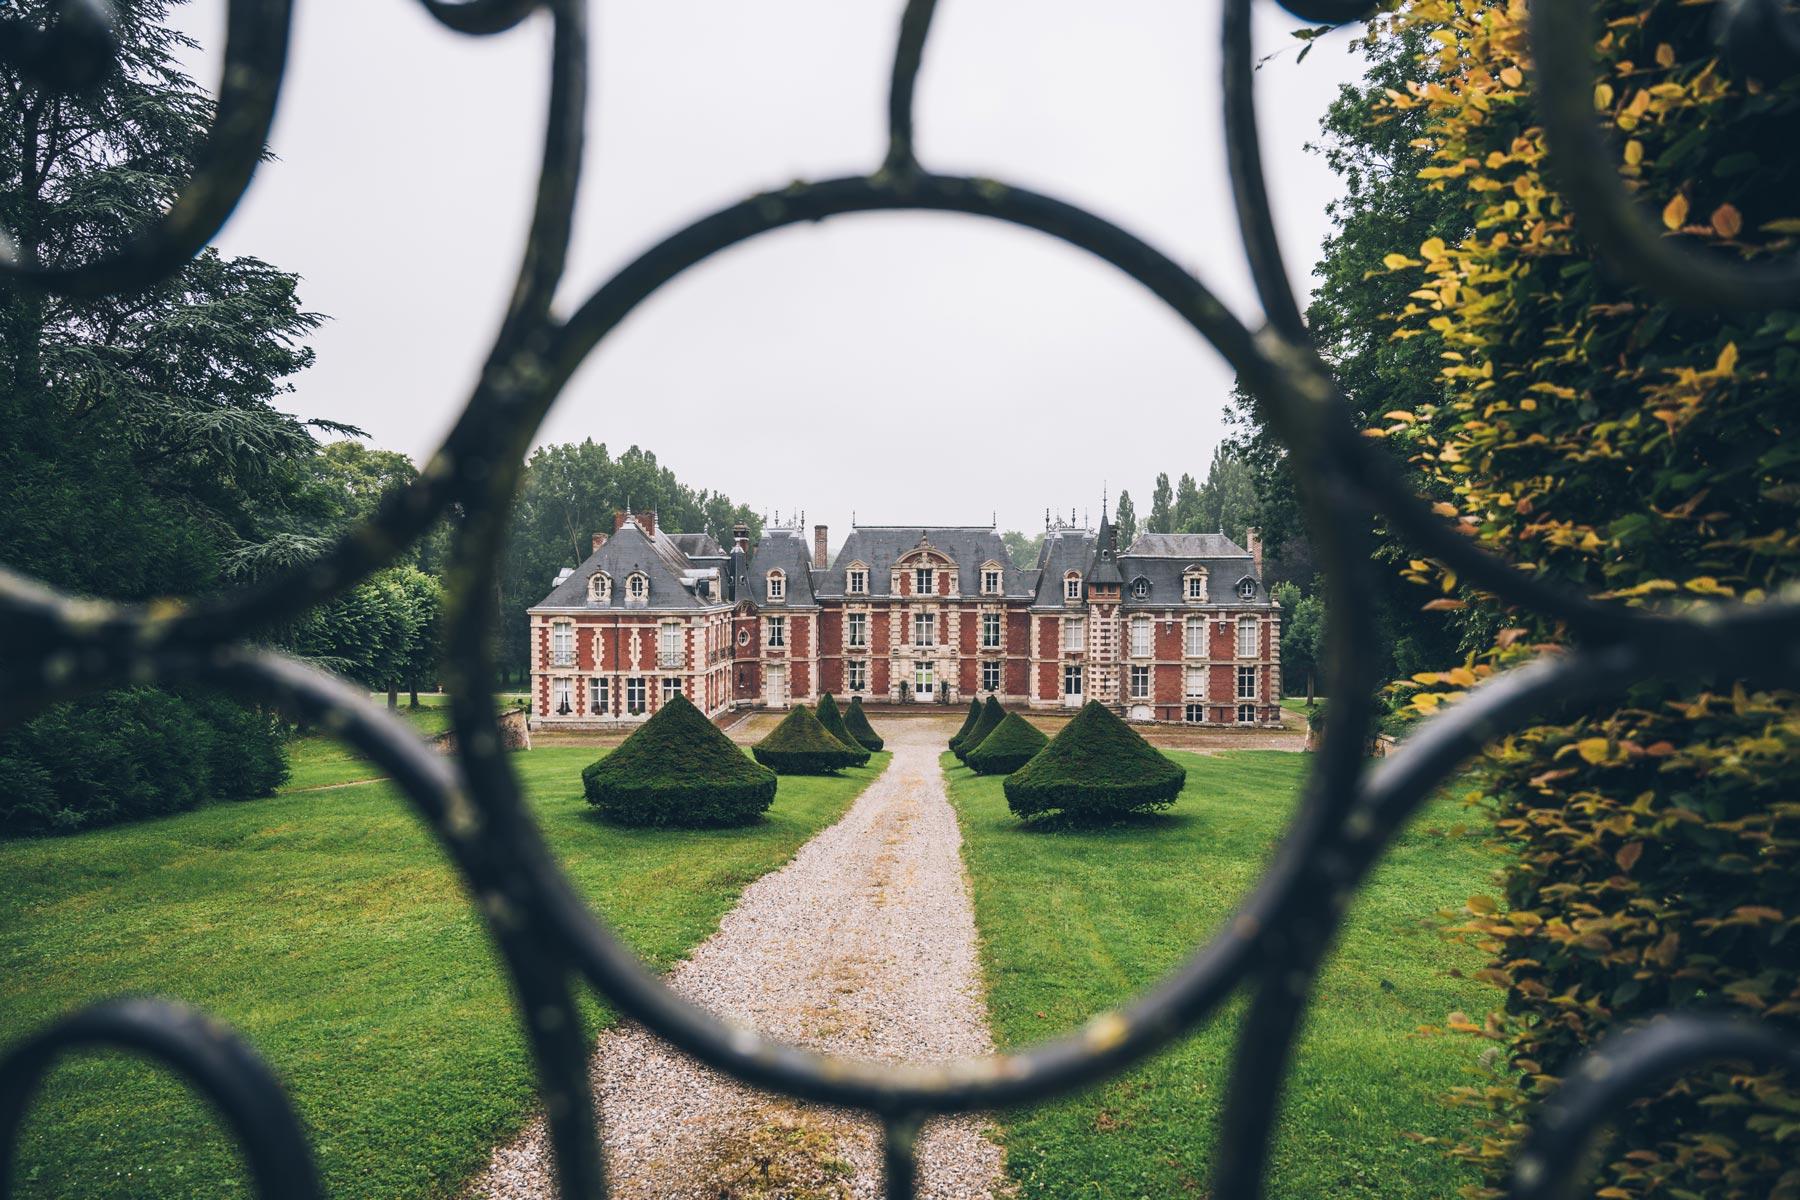 Chateau de Suzanne